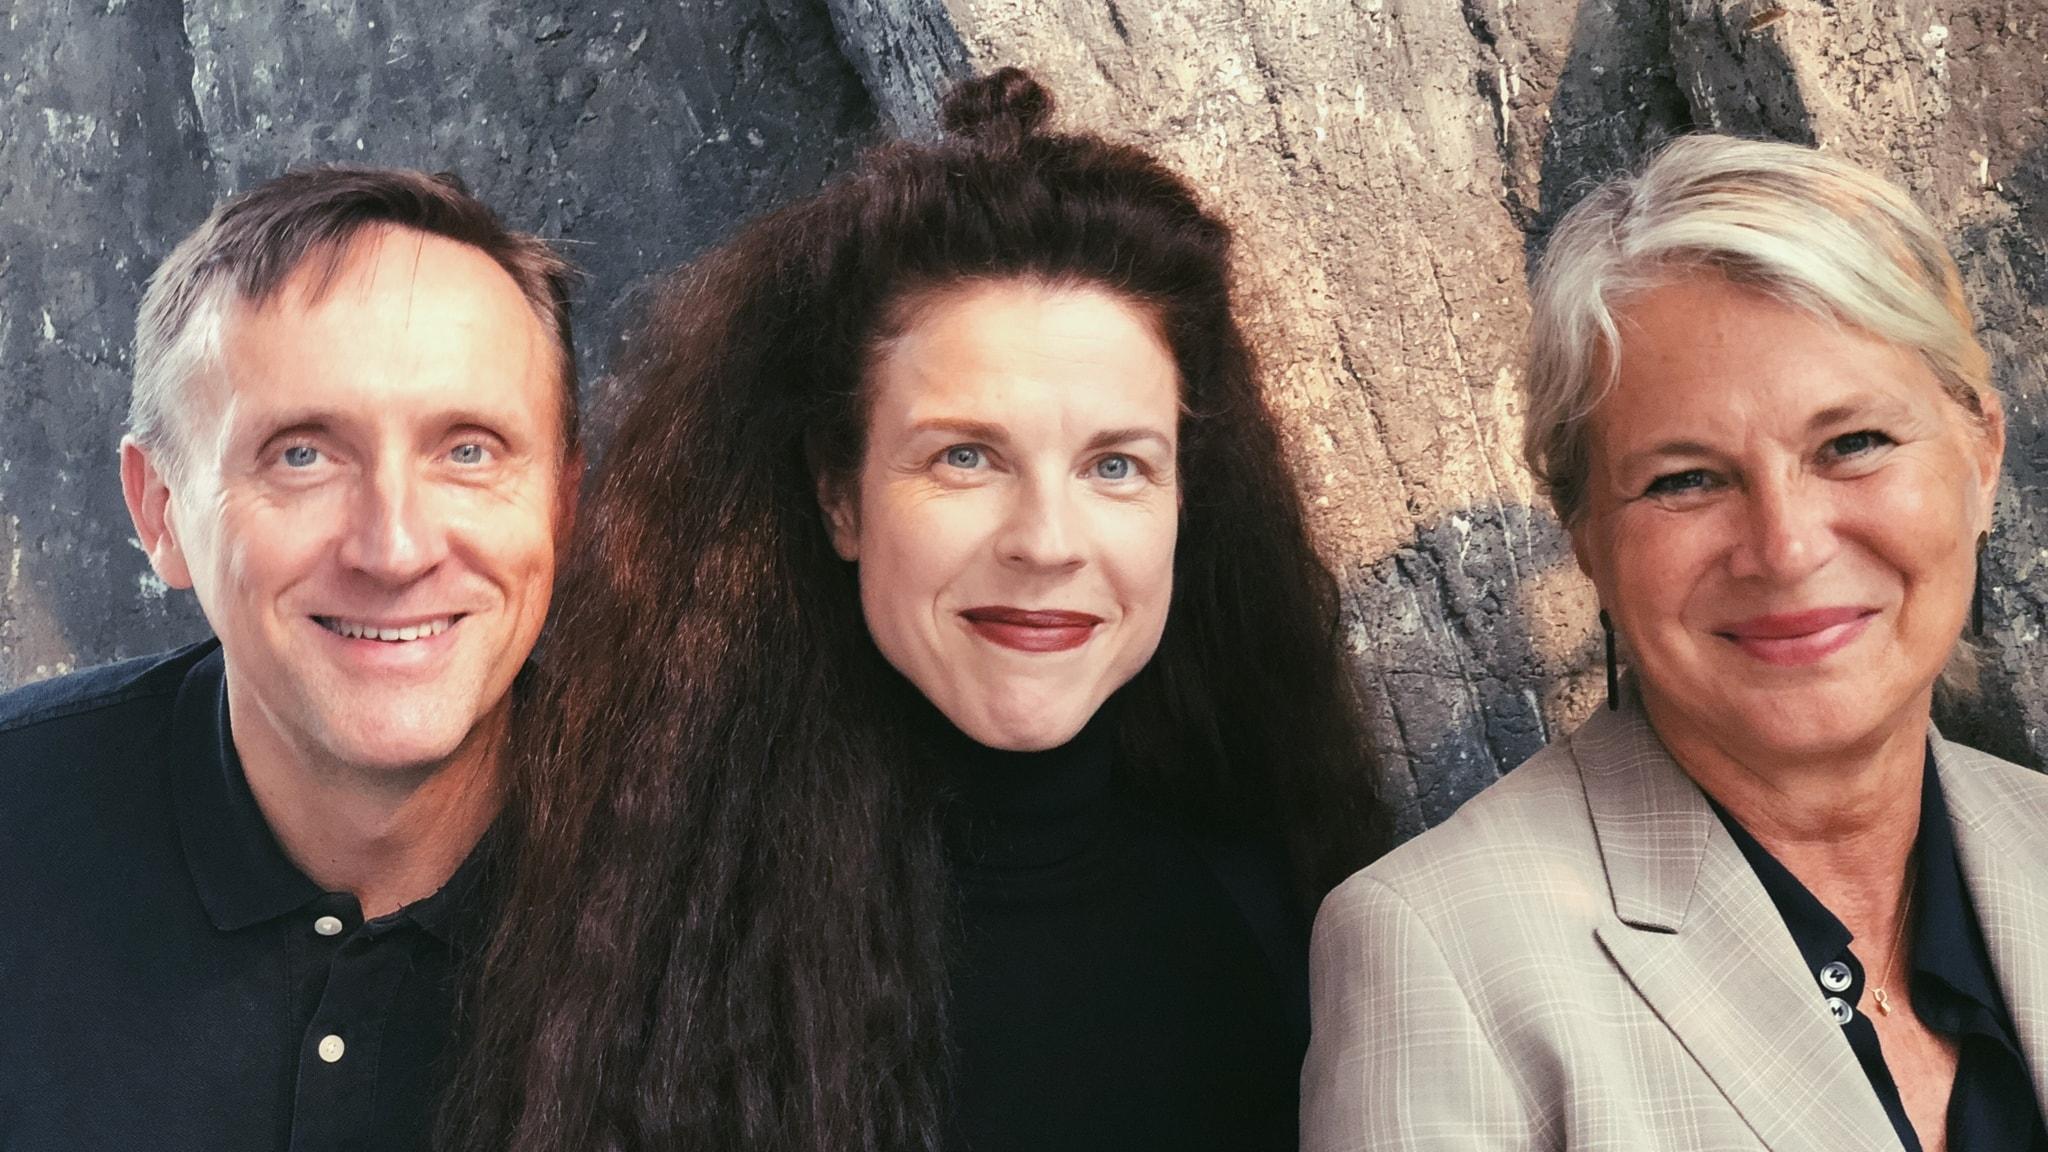 Helena von Zweigbergk, Göran Everdahl och Jessika Gedin.